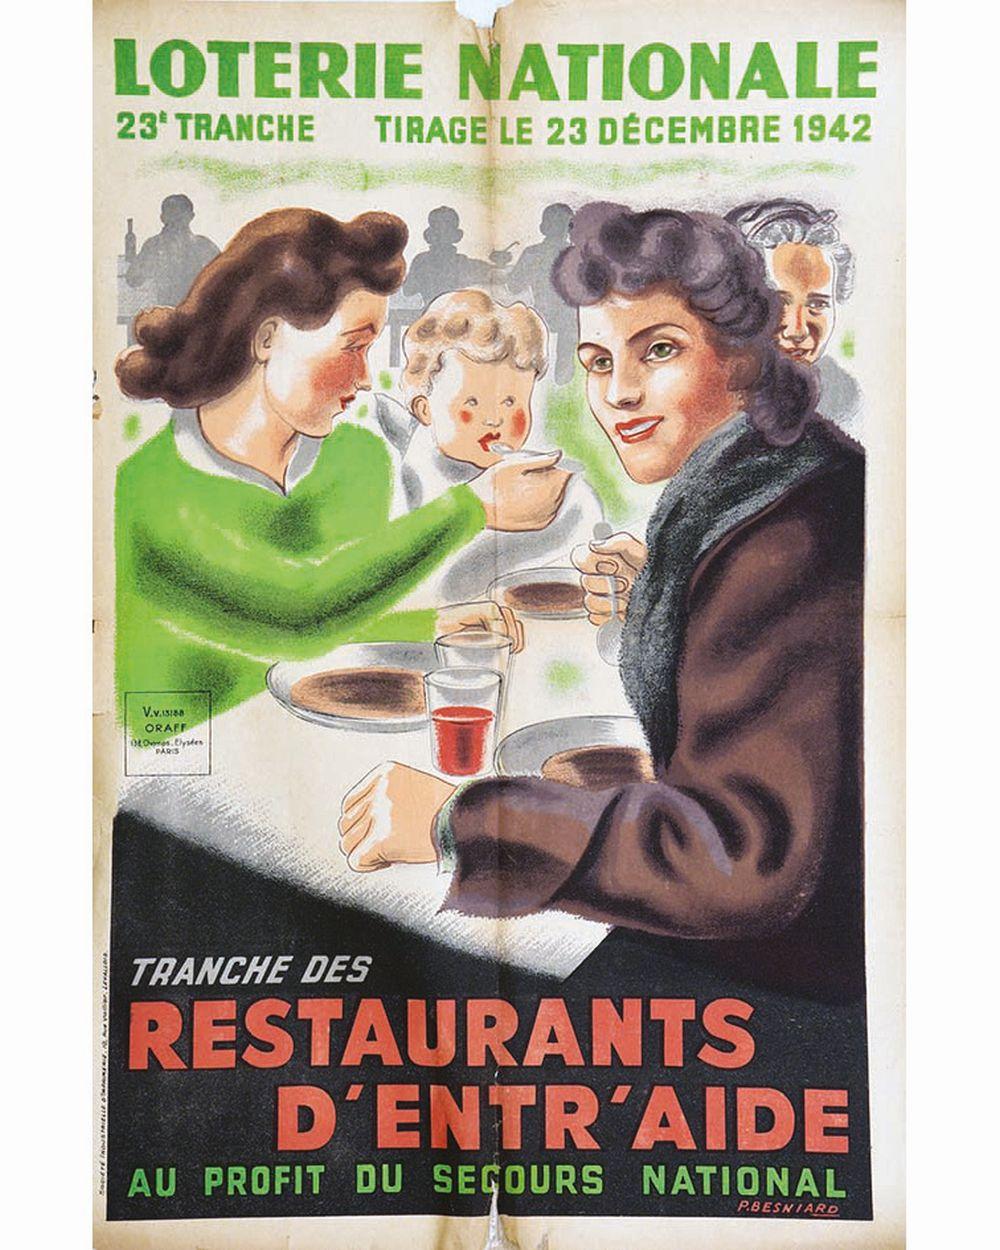 BESNIARD P. - Restaurants d'entr'aide Loterie Nationale     1942